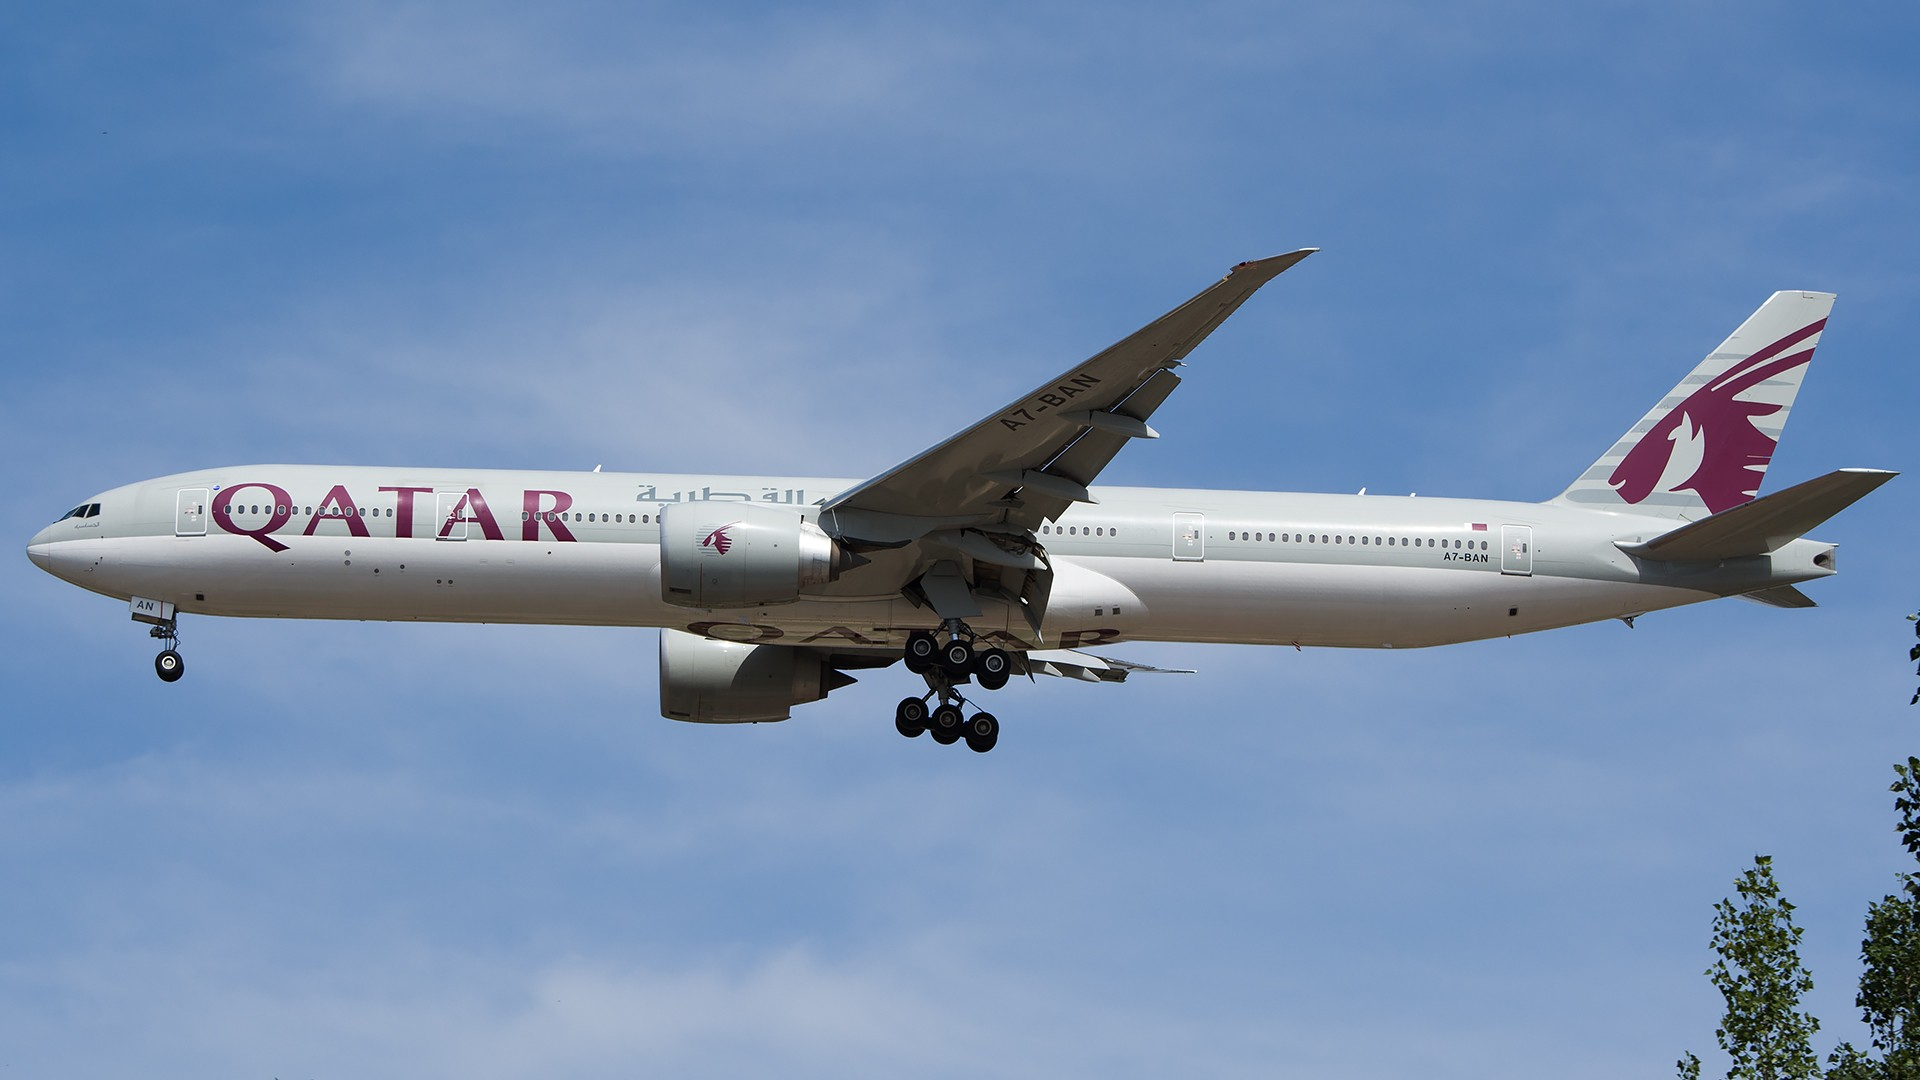 Re:[原创]PEK01午后两小时抓拍,其实是为AA的One World来的 BOEING 777-300ER A7-BAN 中国北京首都国际机场